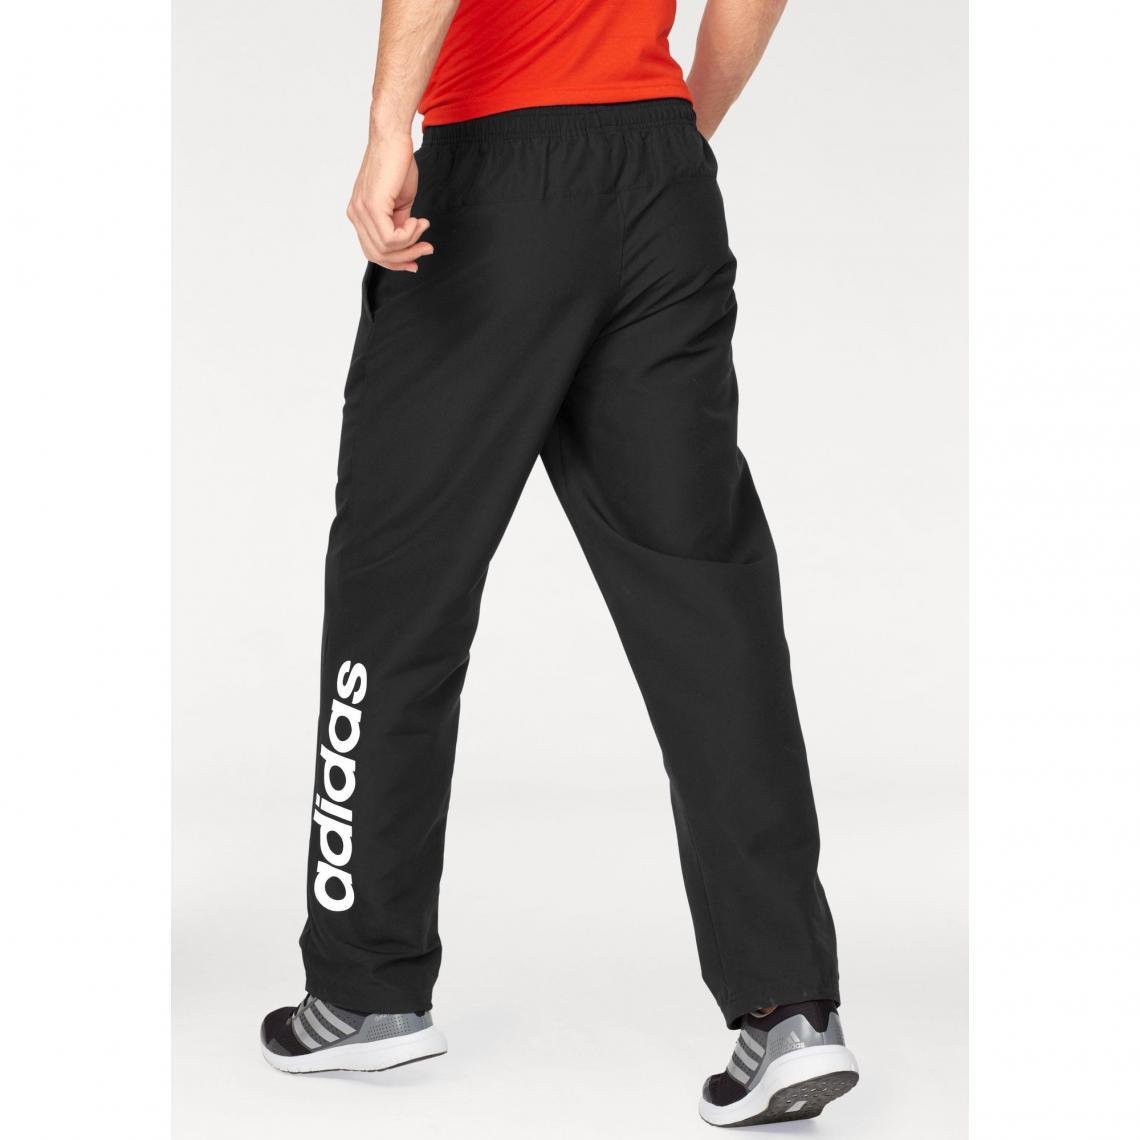 Essentials Linear Adidas Pant Homme Stanford Pantalon De Sport Uxq4YtI